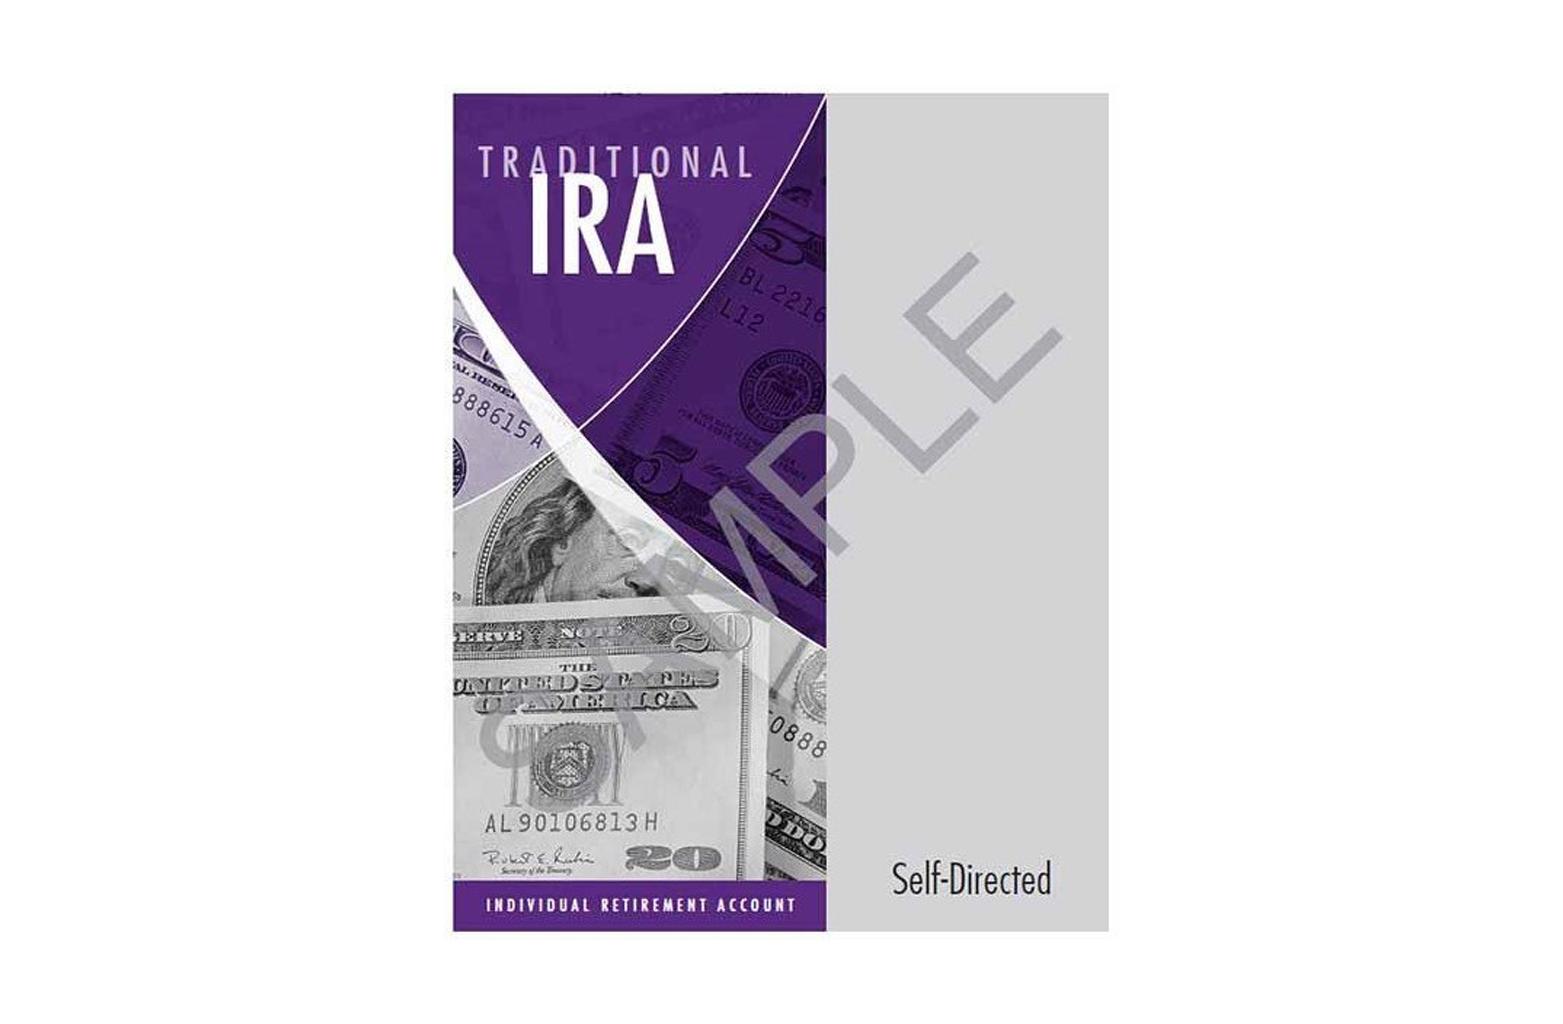 Traditional IRA Organizer - self directed sample